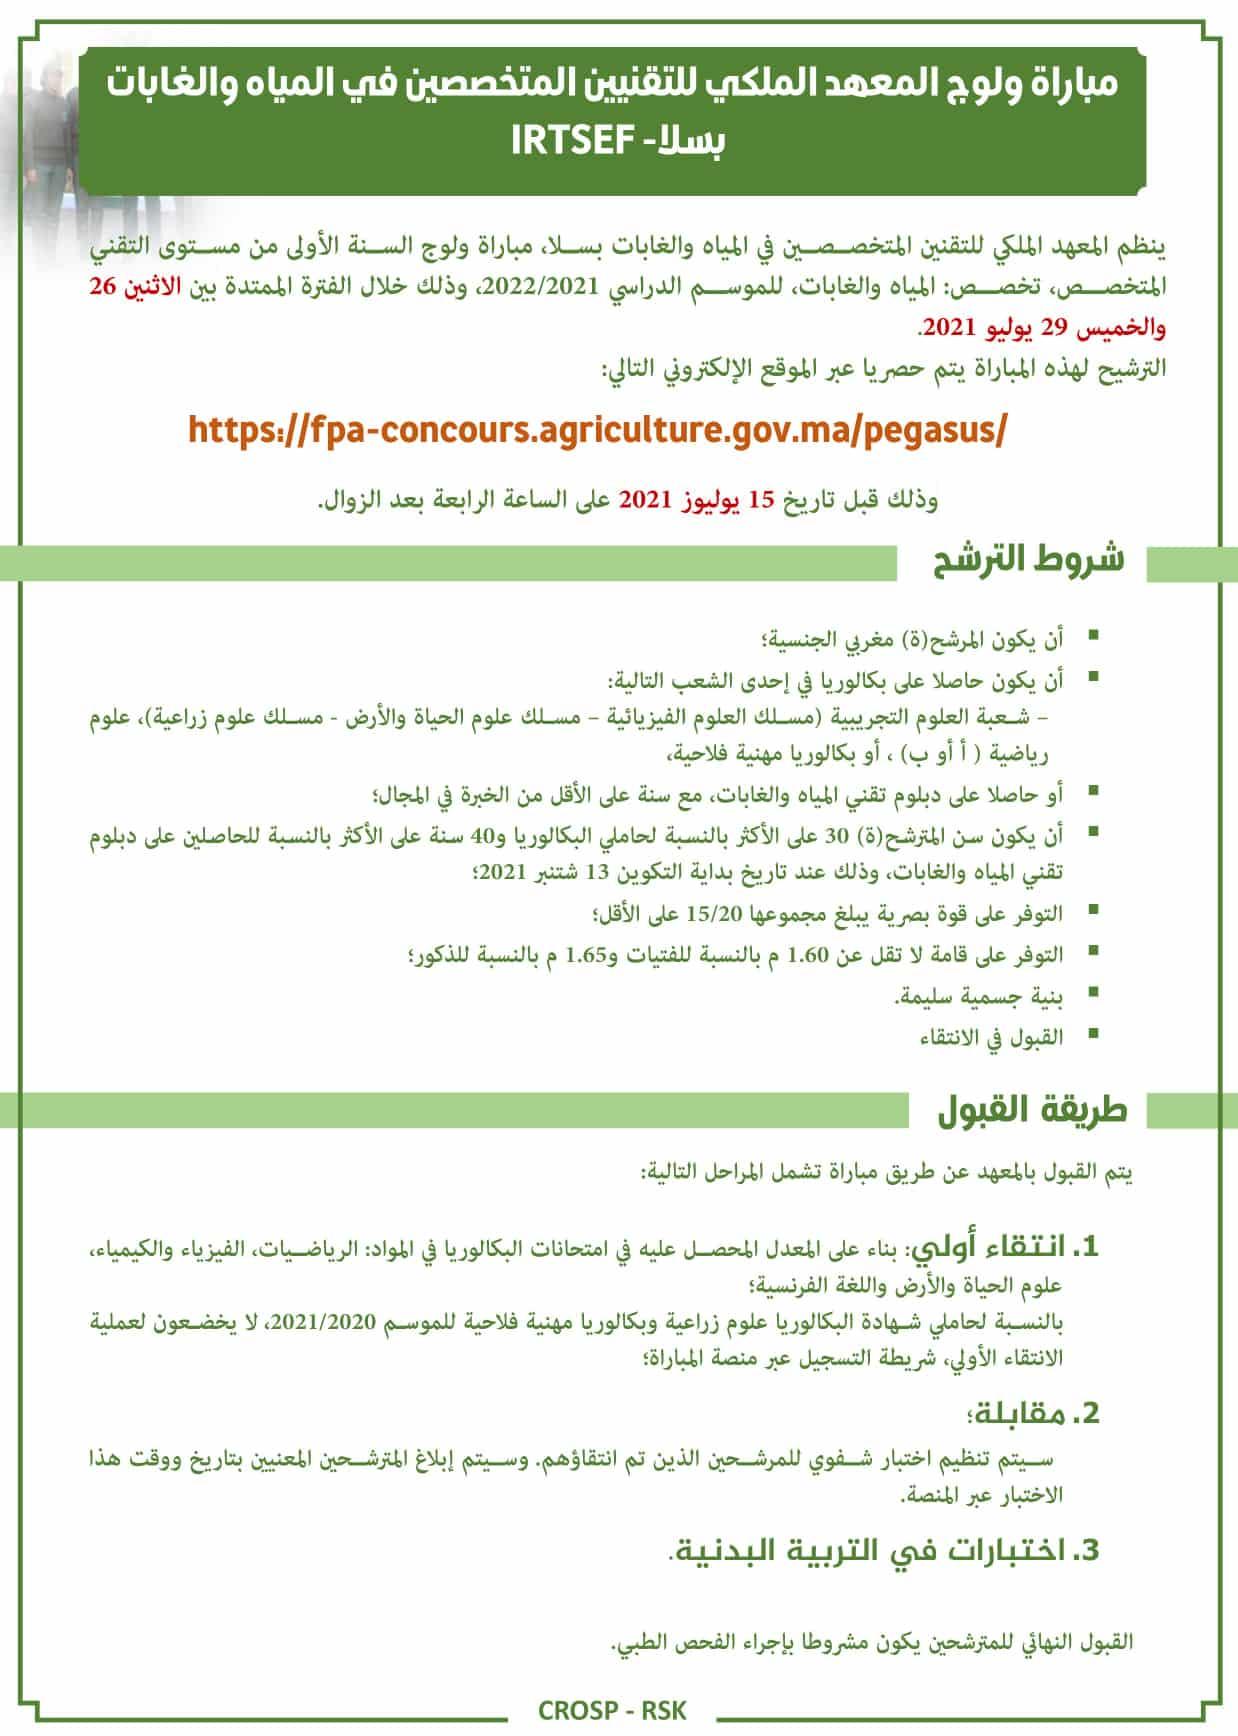 inscription concours irtsef 2021 مباراة ولوج المعهد الملكي للتقنيين المياه والغابات 2022/2021